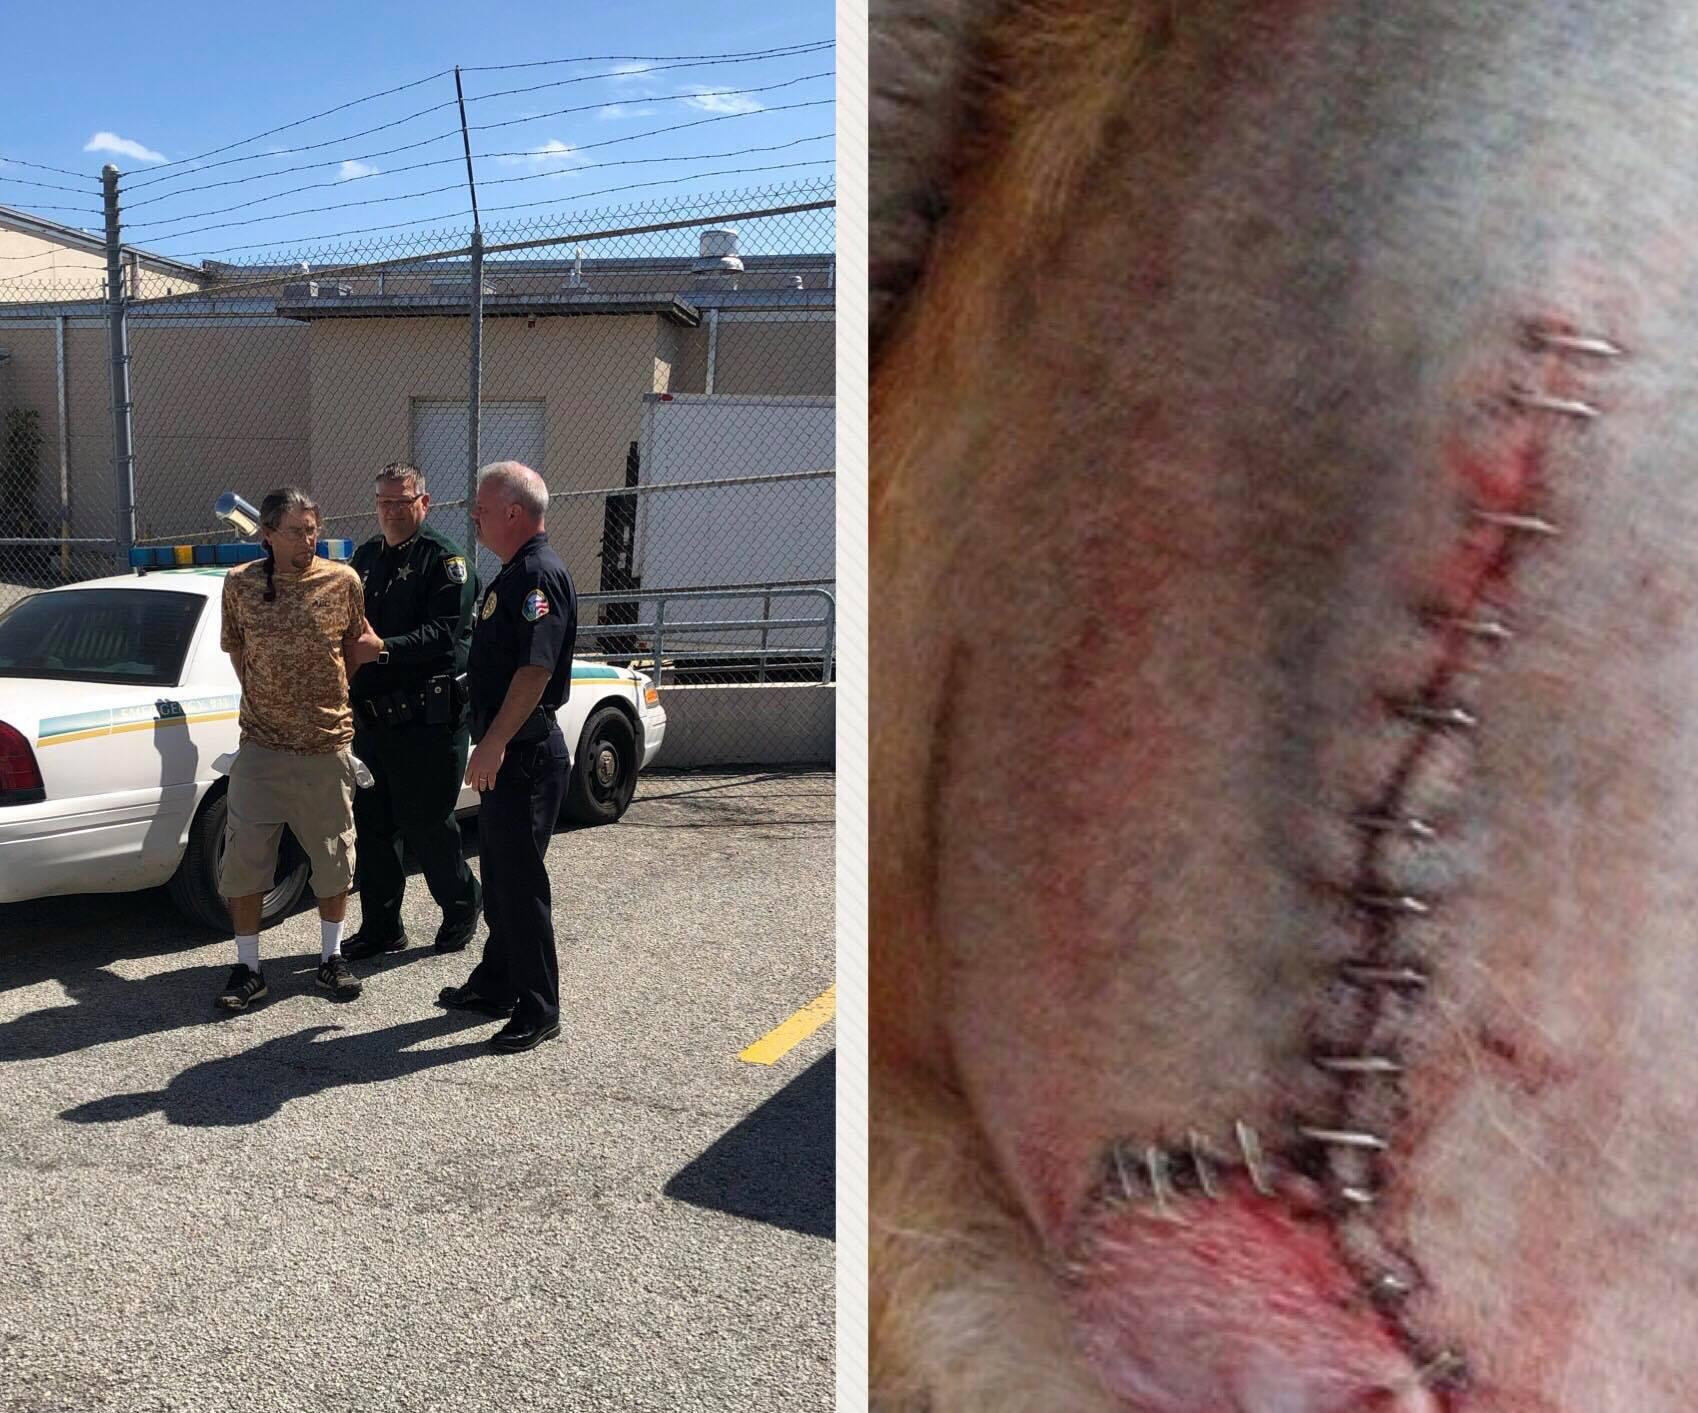 Brevard County groomer arrest_1551196059035.jpg-873774424.jpg